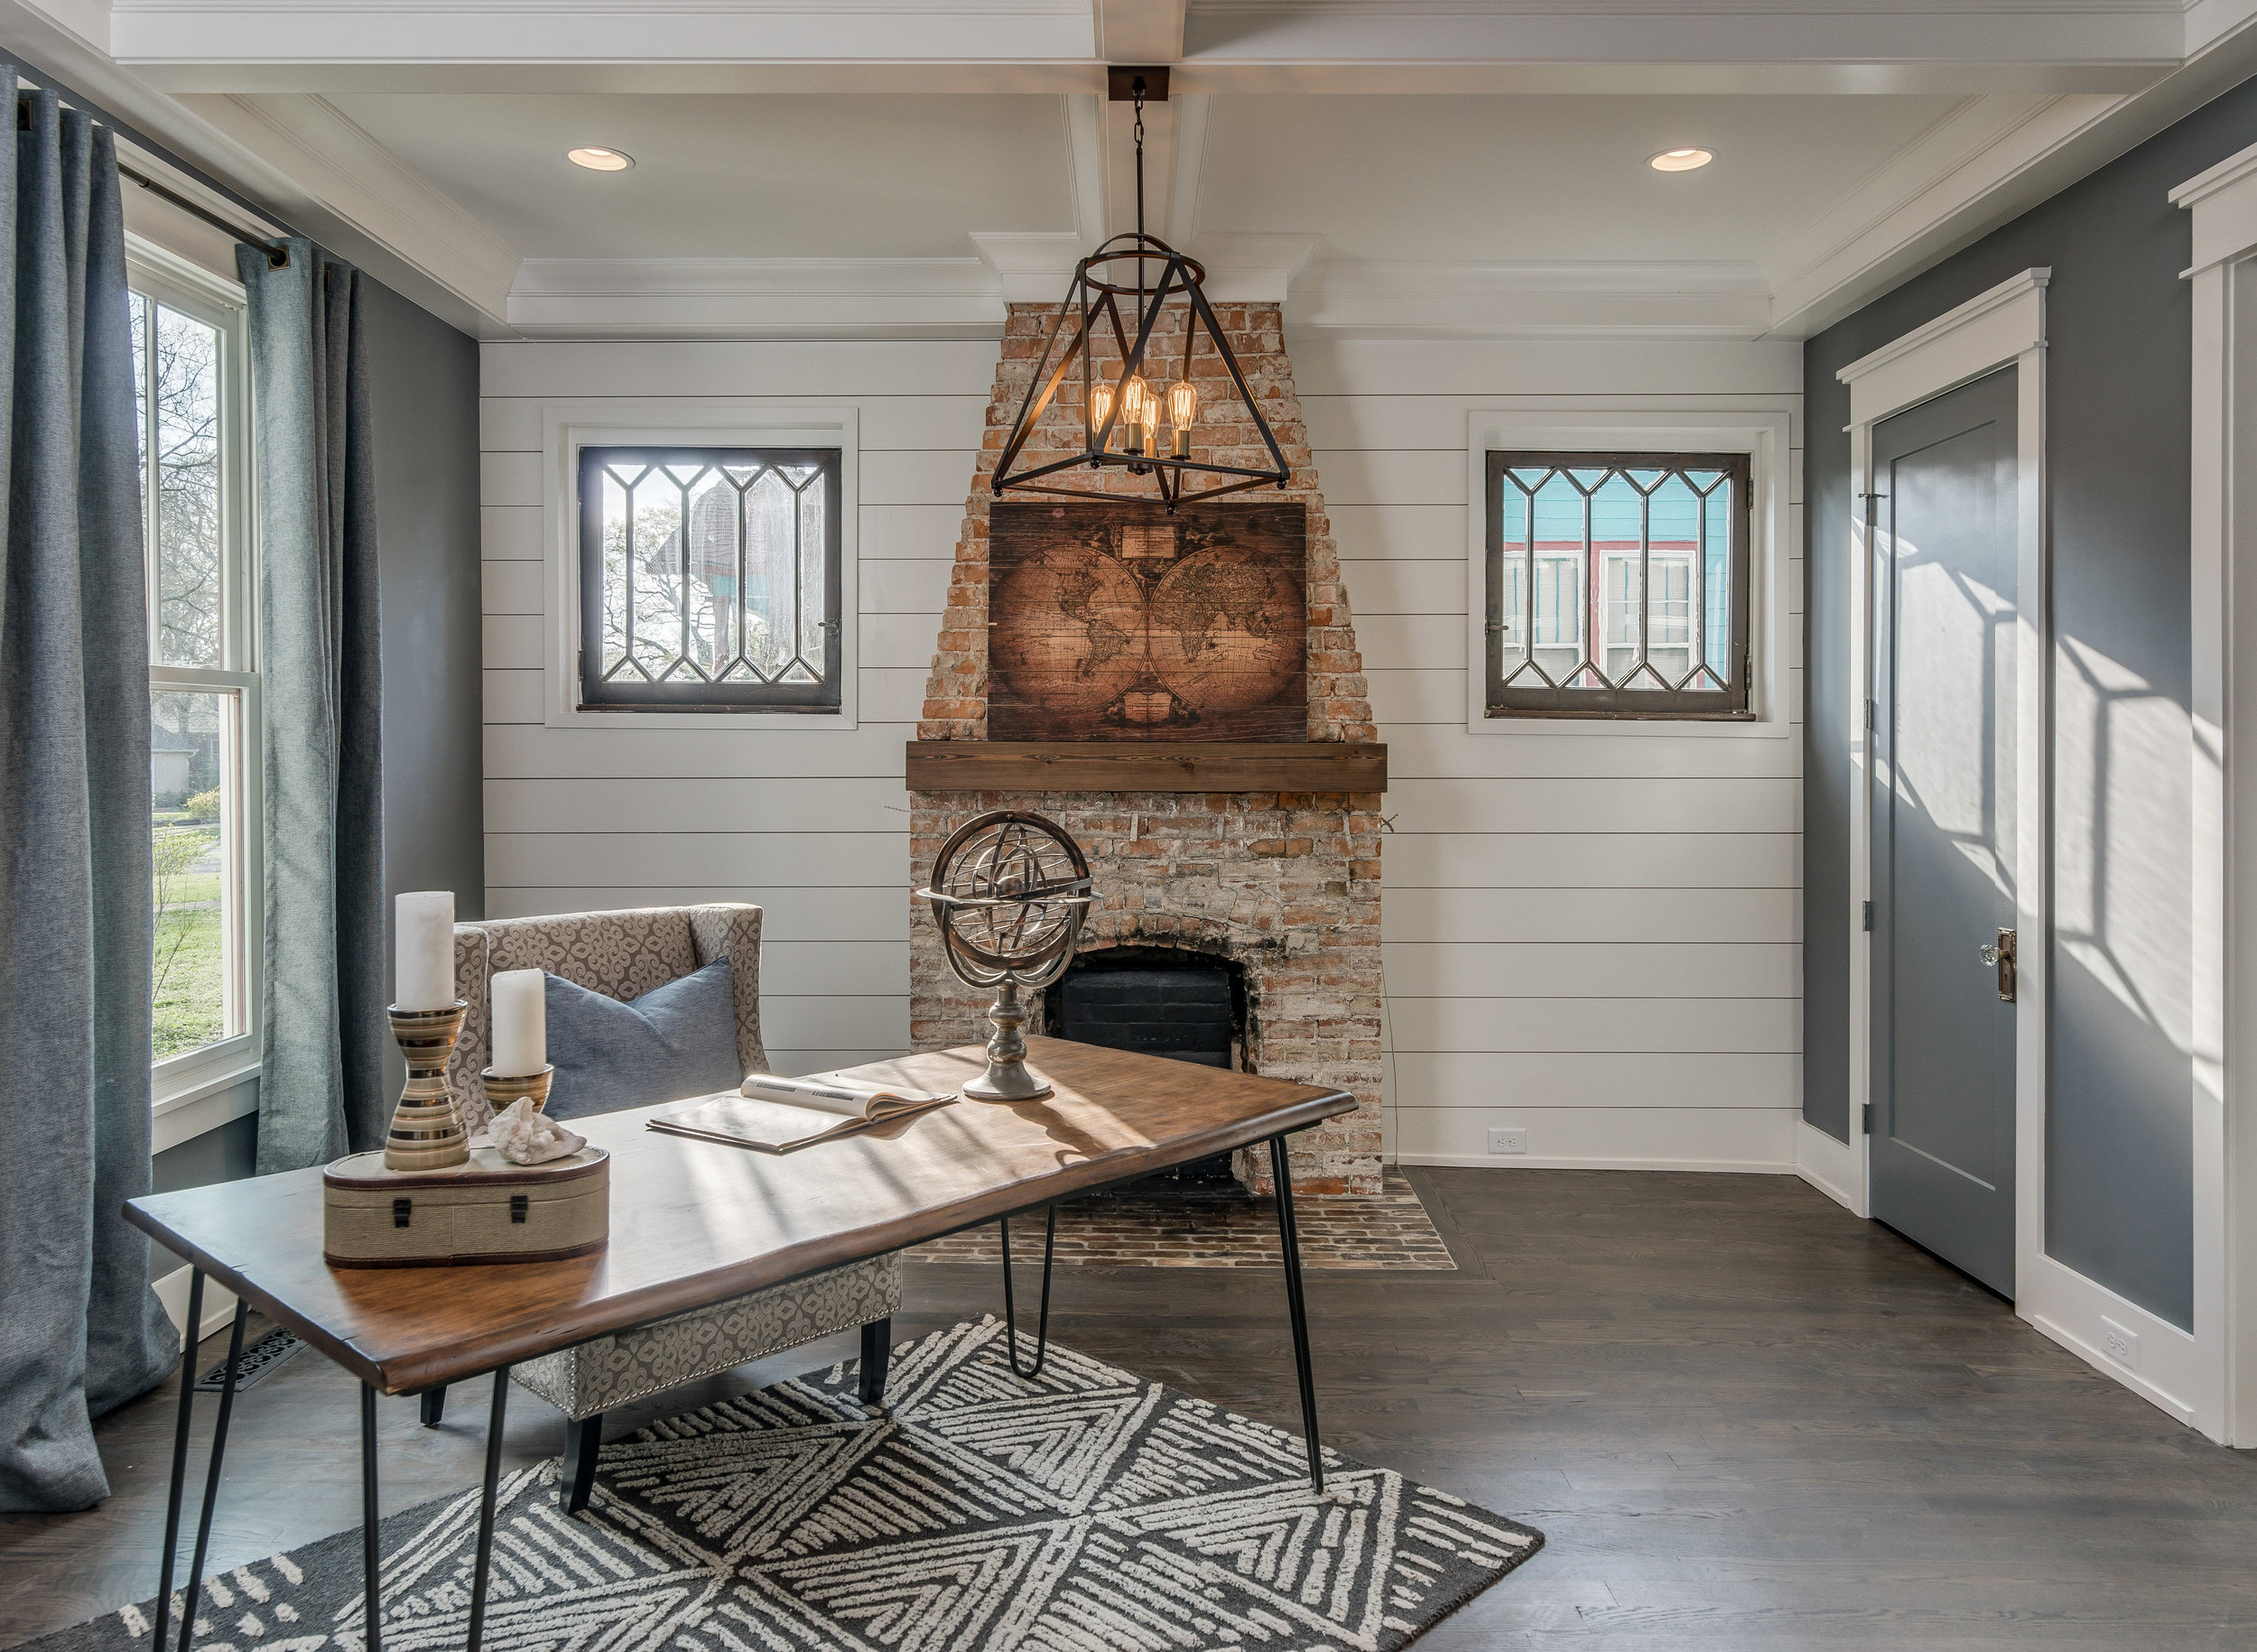 custom-home-renovation-remodel-historic-preservation-nashville-tennessee-britt-development-group-1009.jpg